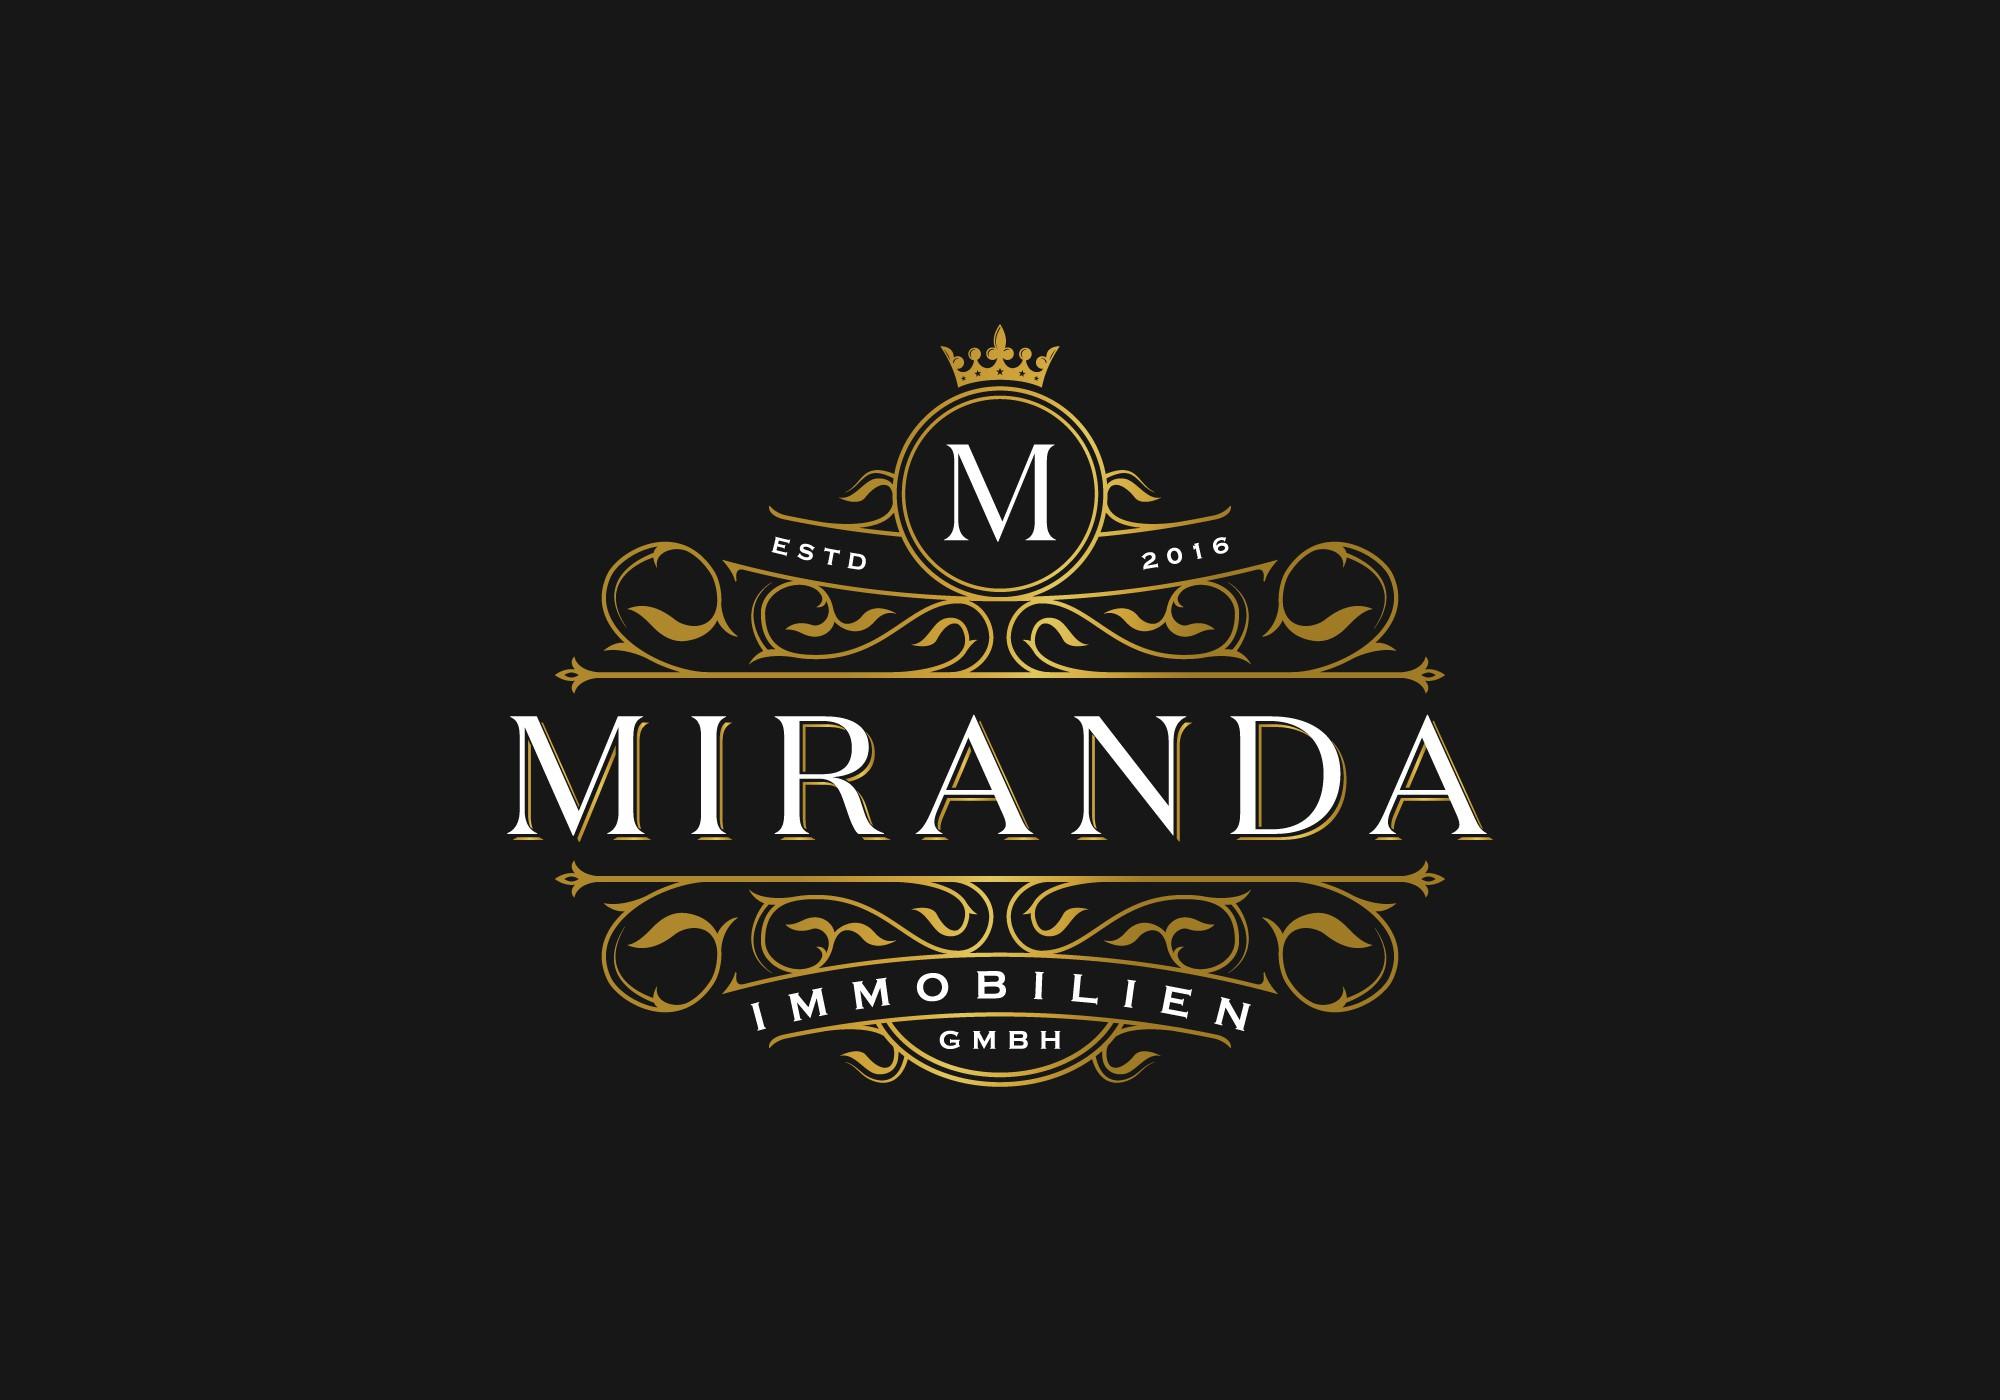 Miranda Immobilien